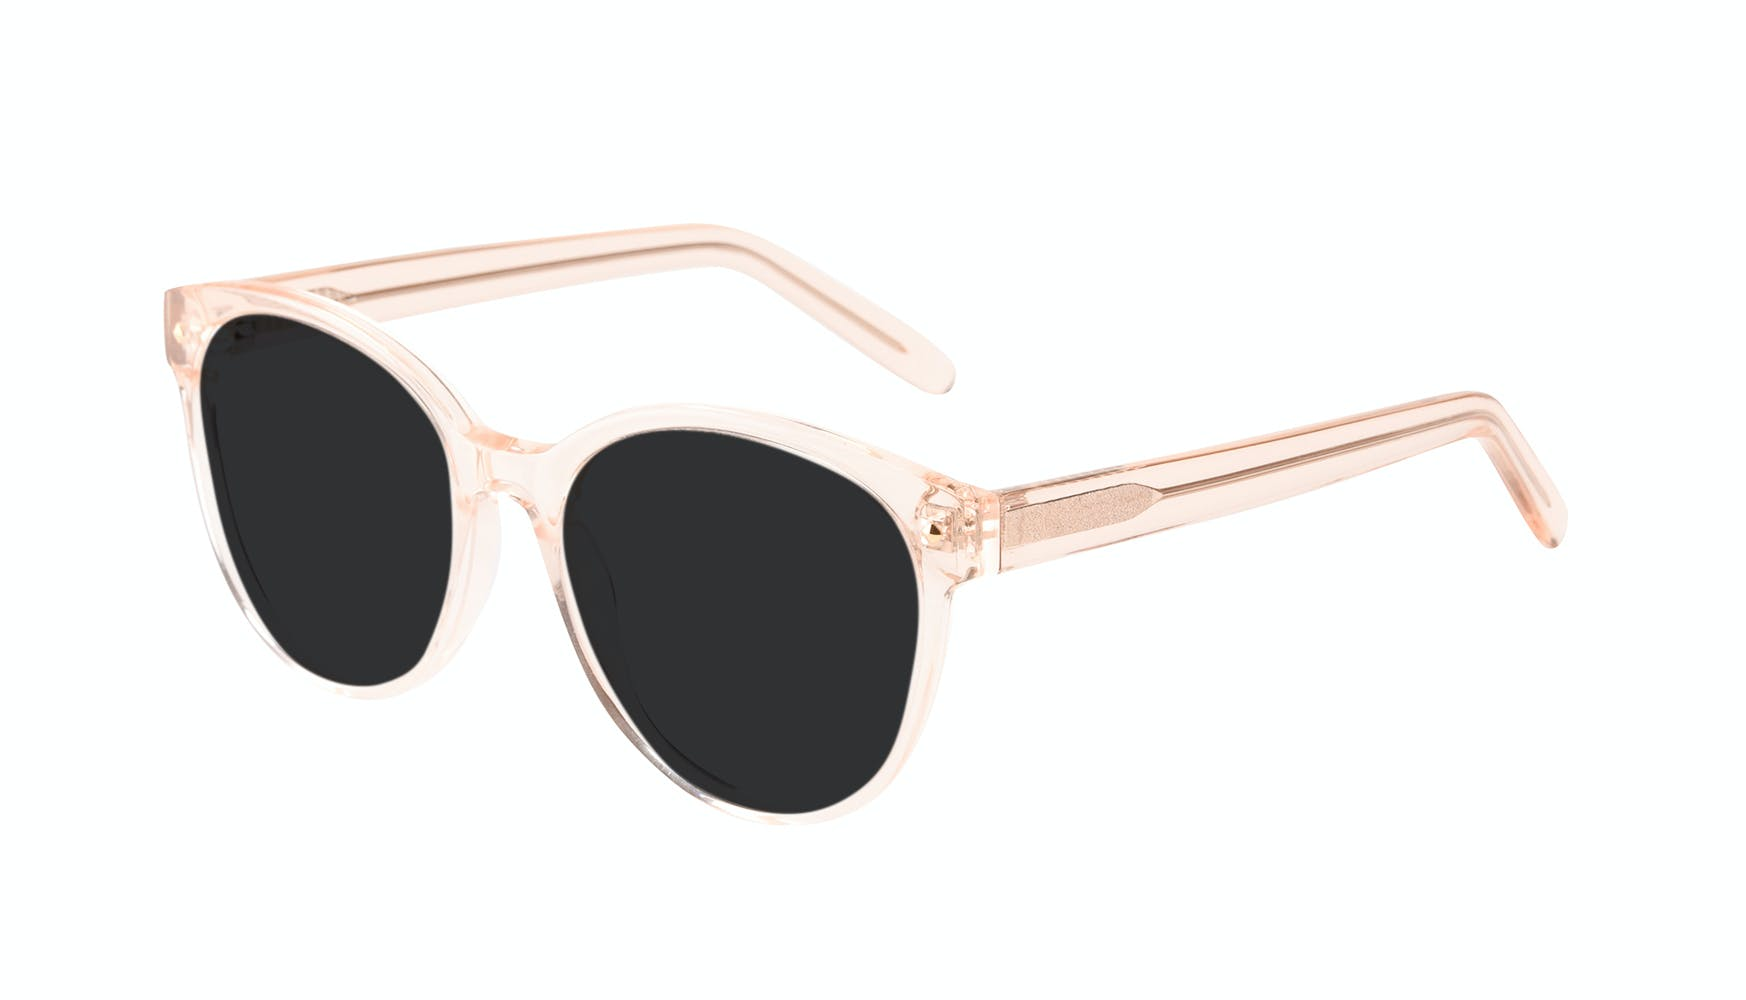 Affordable Fashion Glasses Round Sunglasses Women Eclipse Blond Tilt